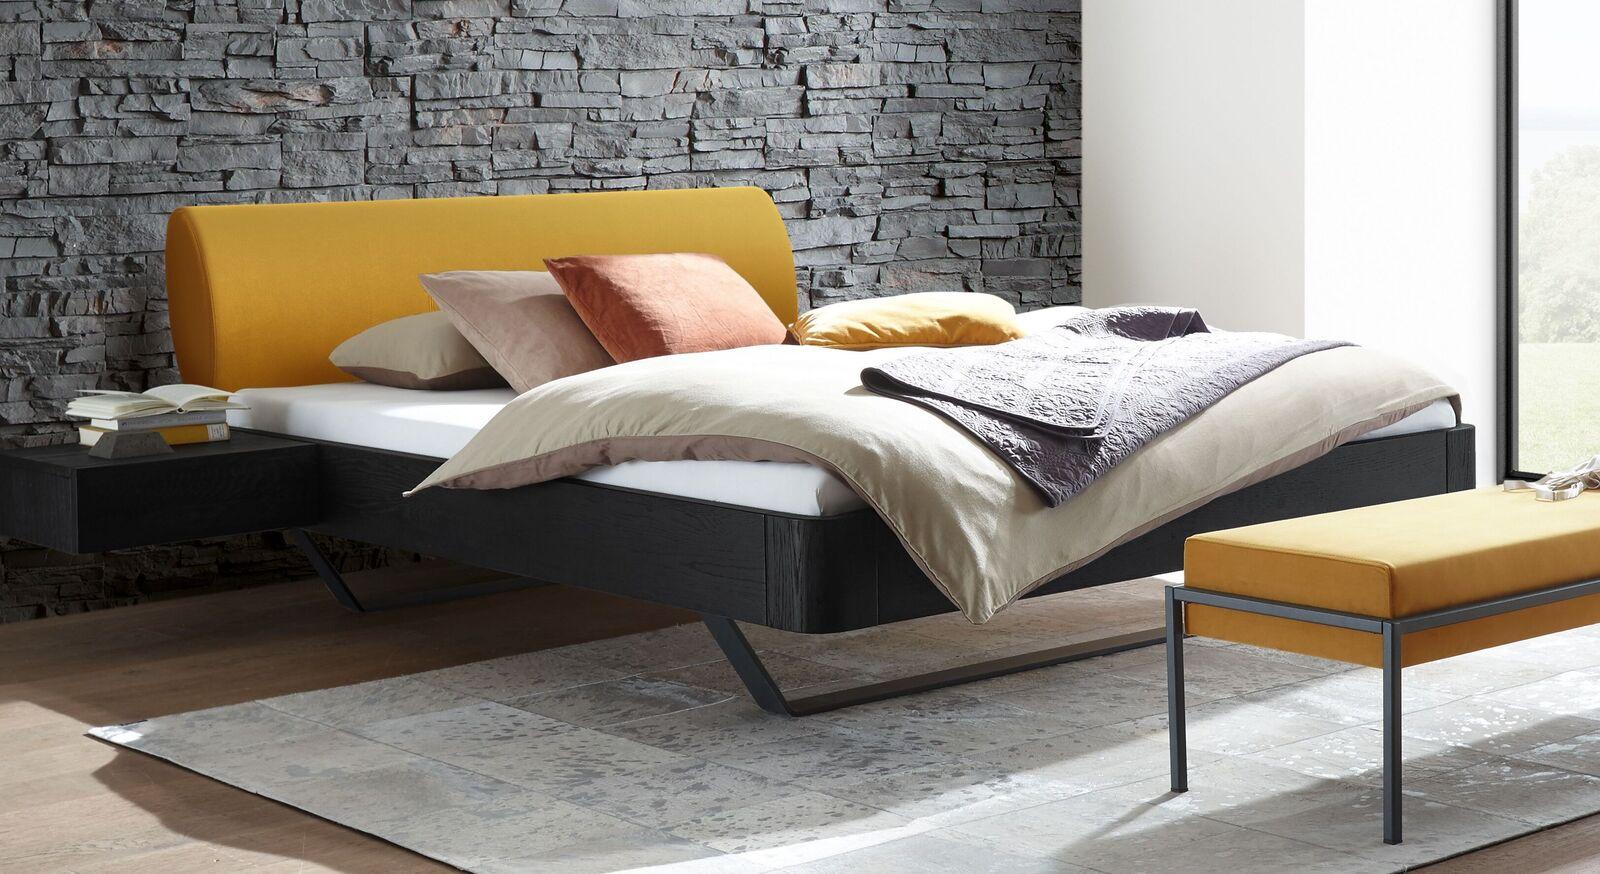 Bett Amagio mit massivem Eichenholzrahmen